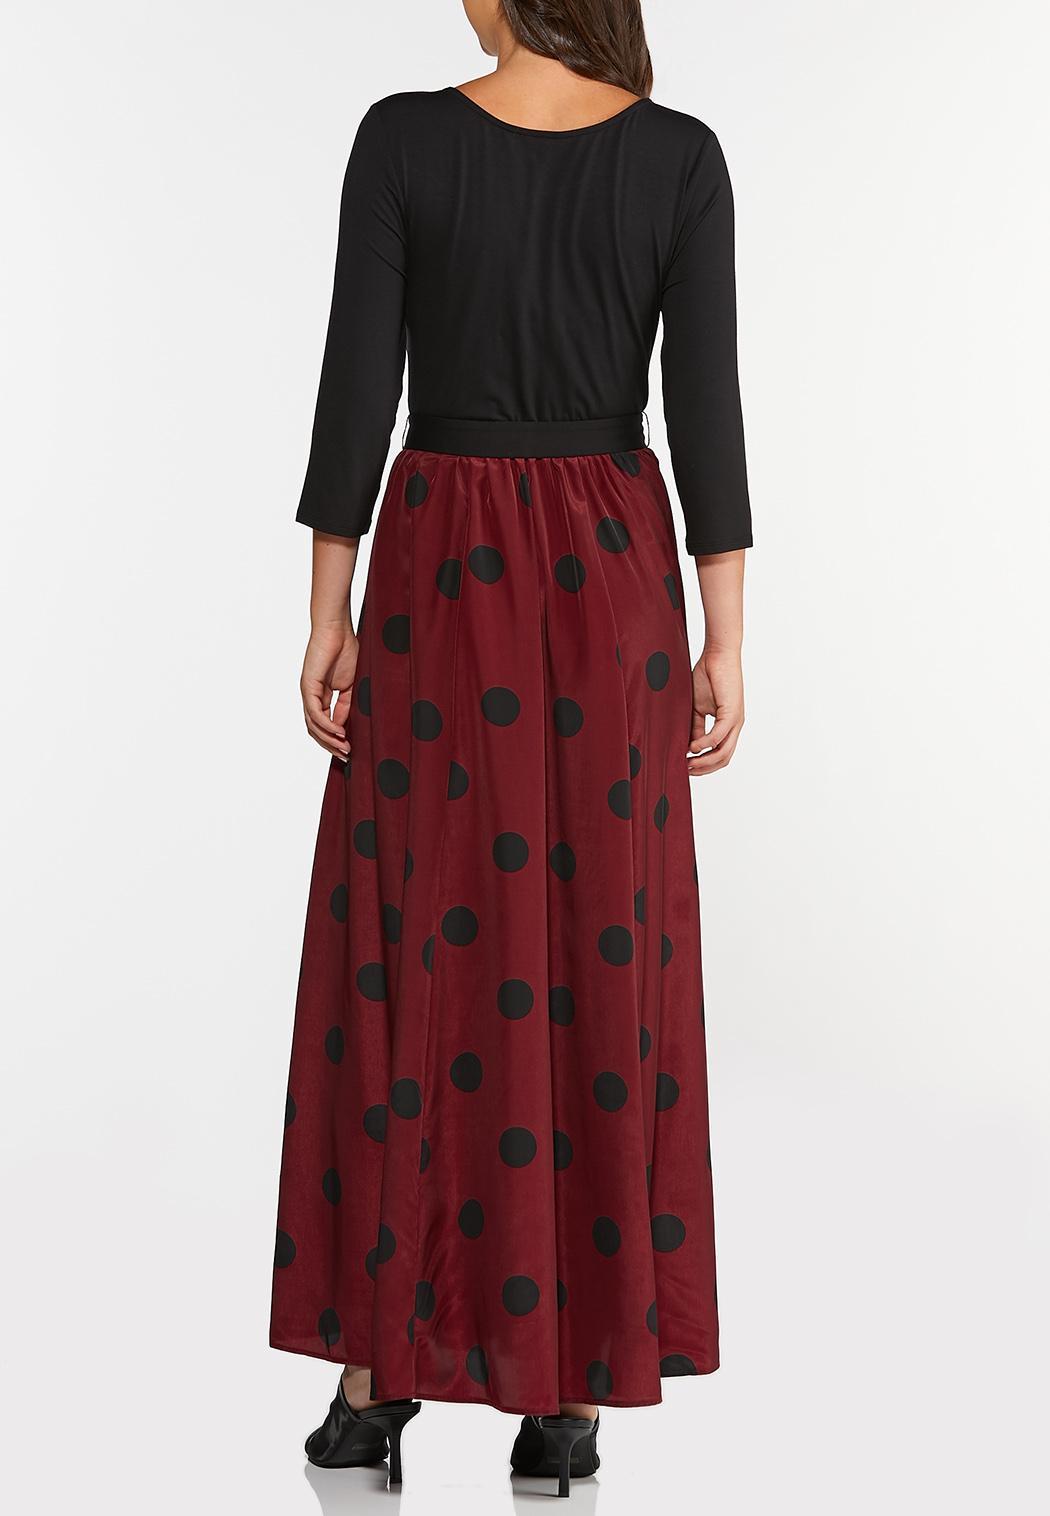 Polka Dot Colorblock Dress (Item #44357483)